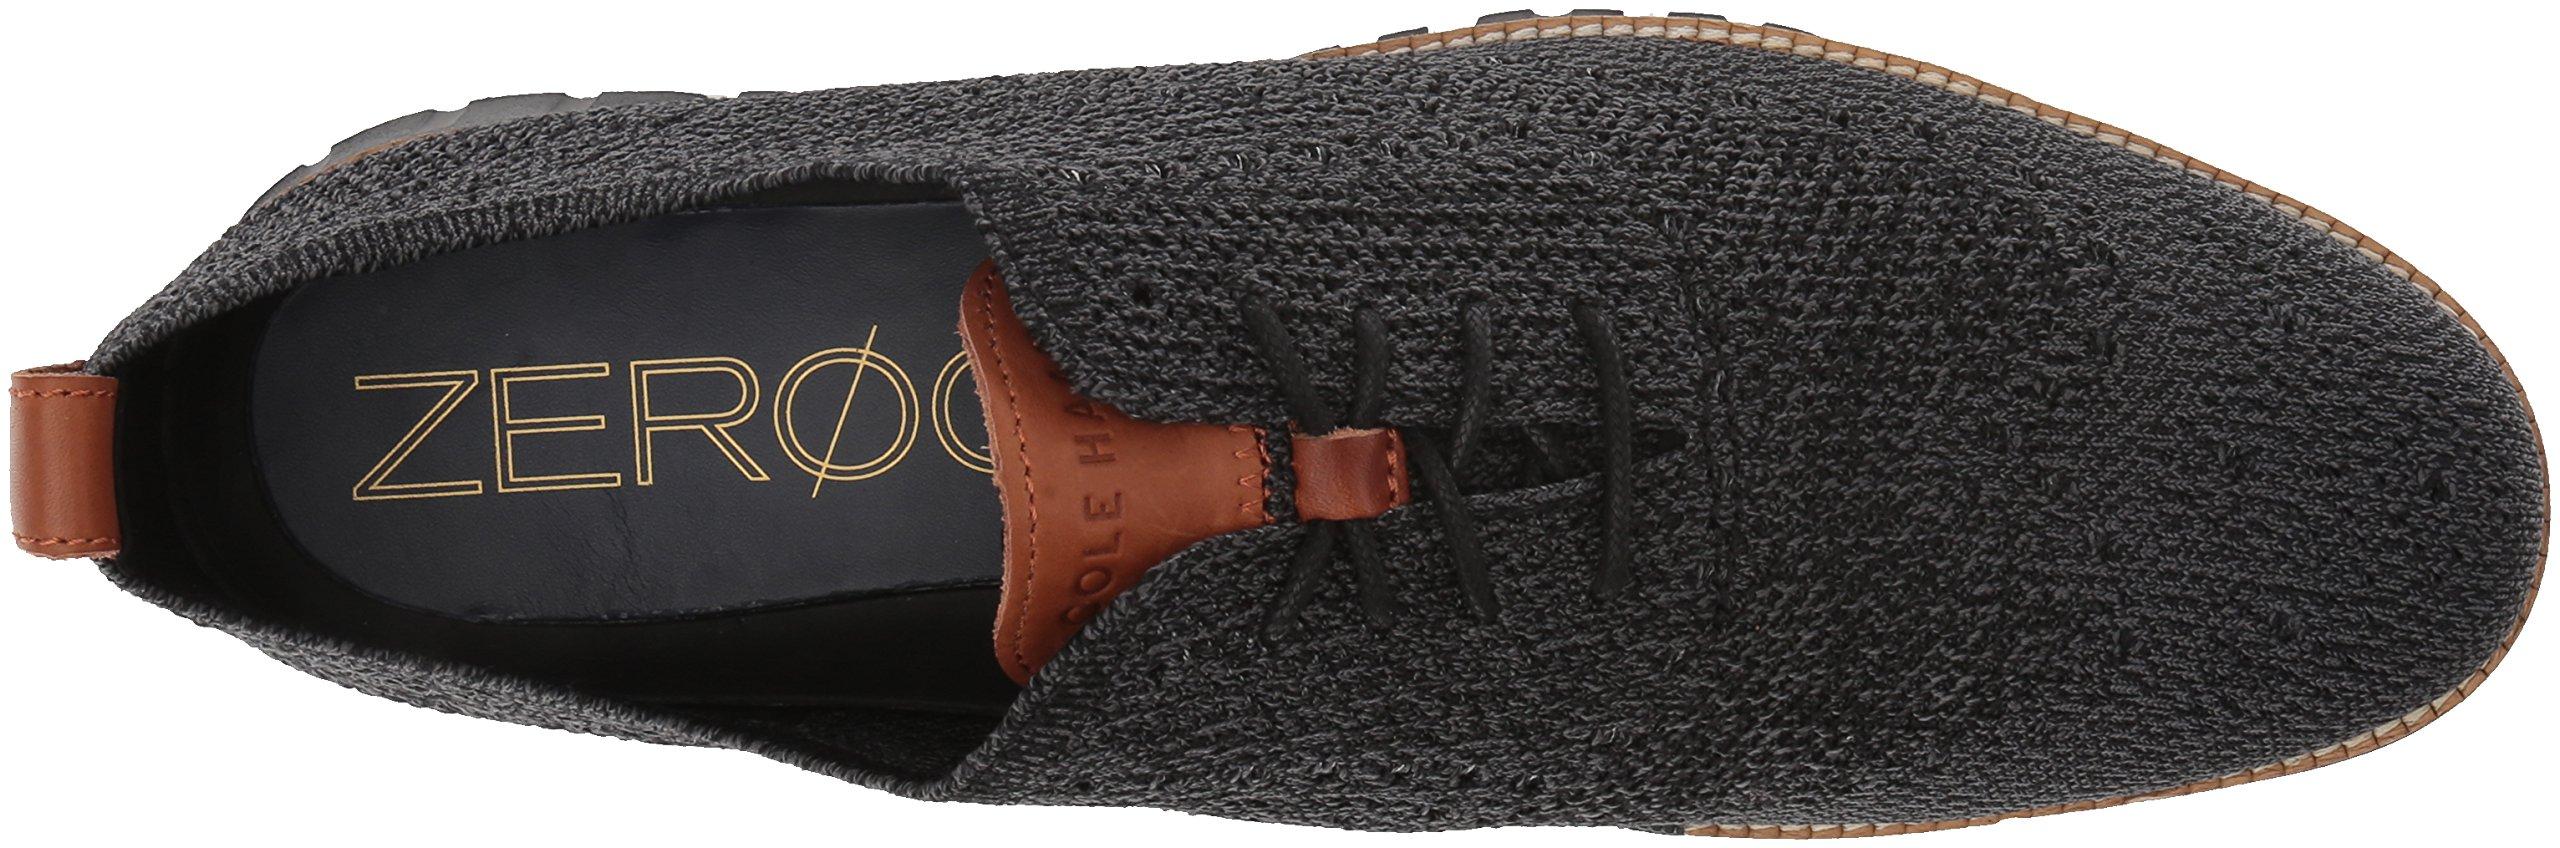 Cole Haan Men's Zerogrand Stitchlite Oxford, Black/Magnet/Black, 10.5 Medium US by Cole Haan (Image #8)